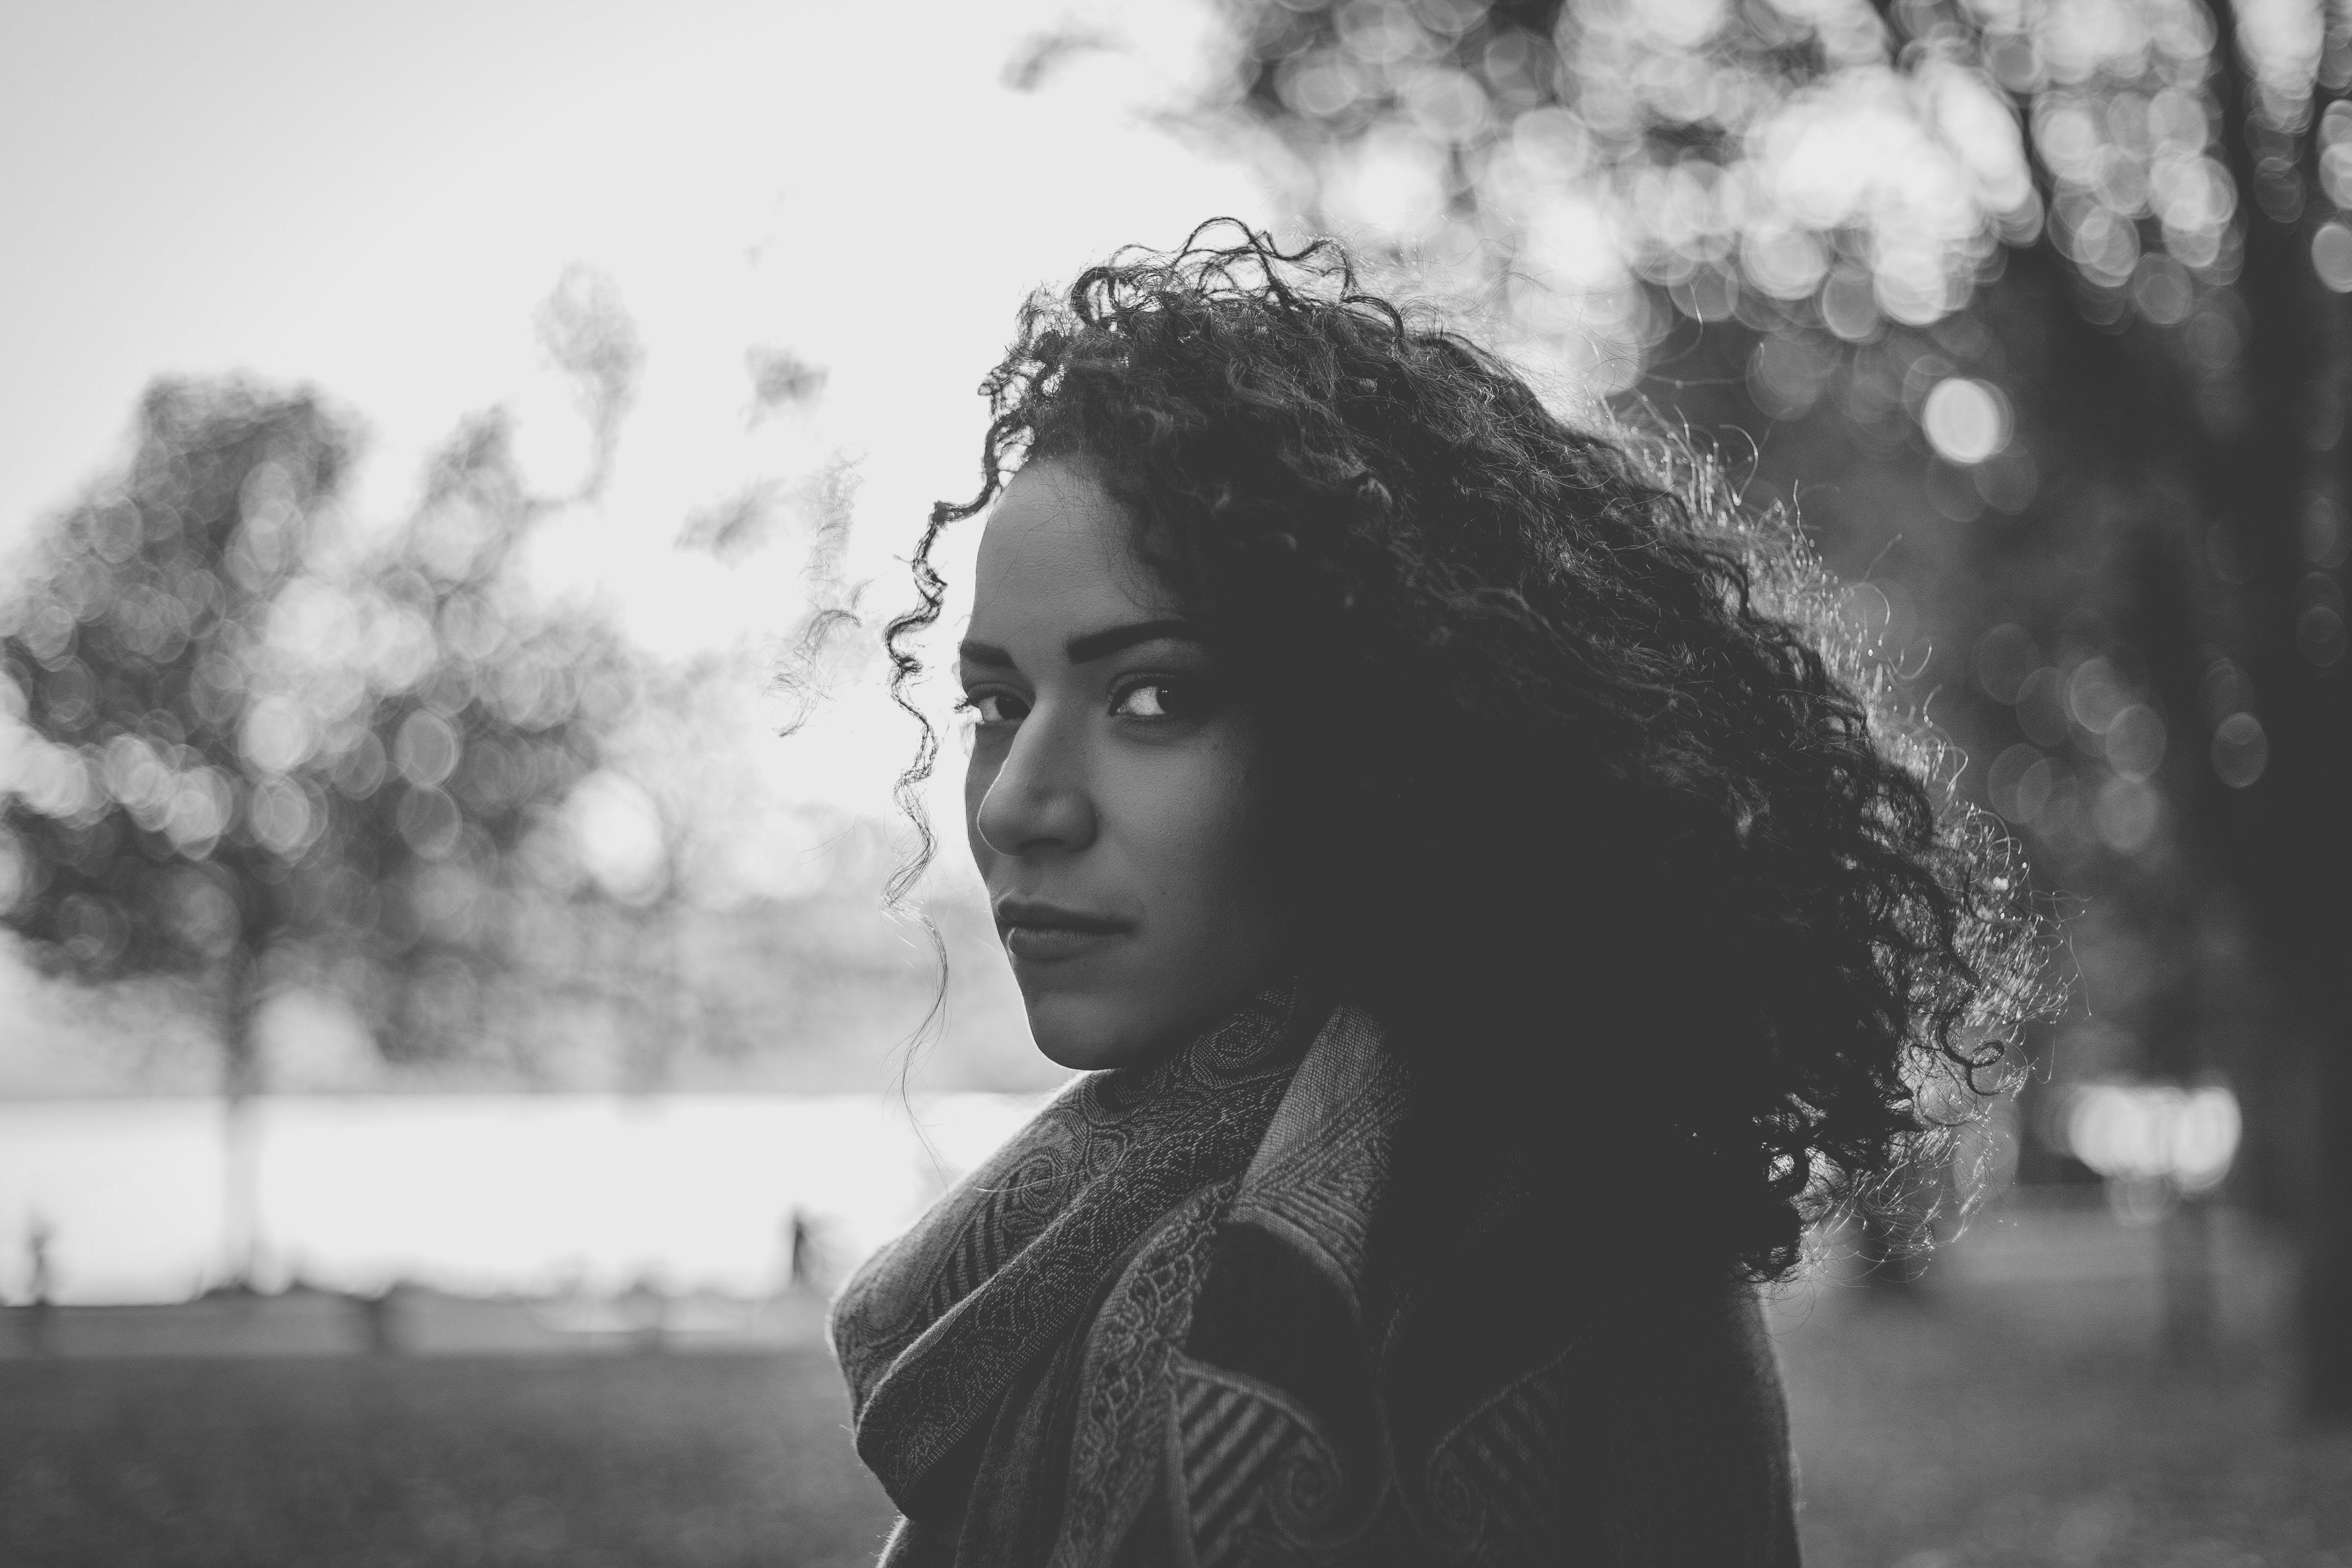 Woman Wearing Scarf Grayscale Photo